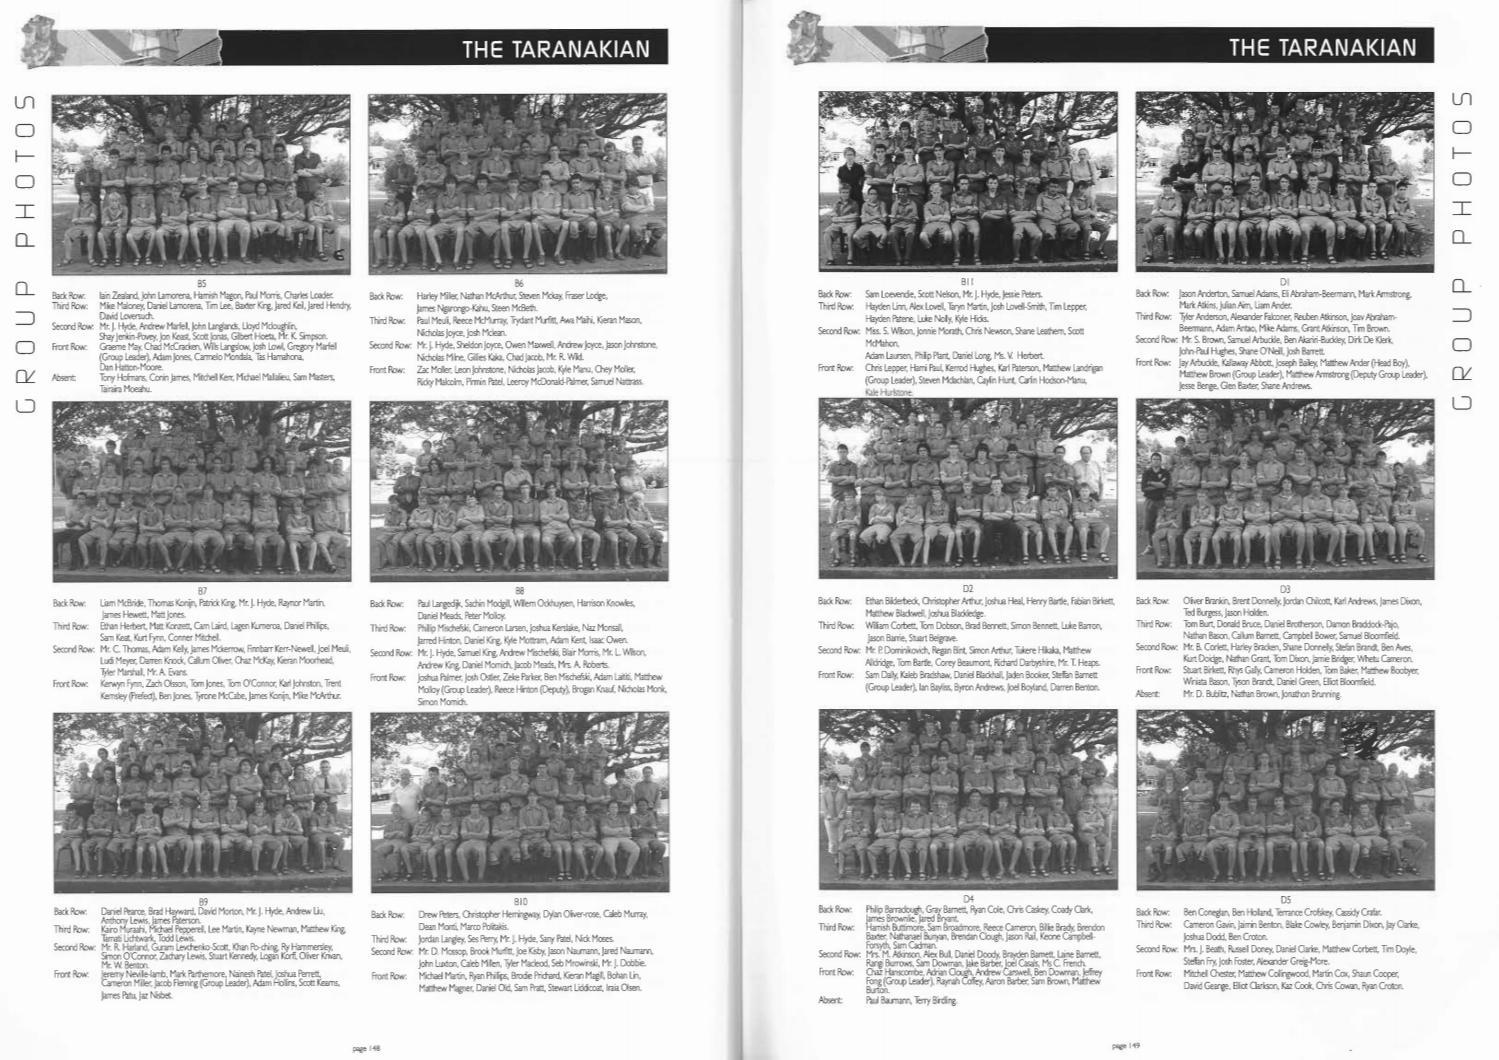 2005 The Taranakian By New Plymouth Boys High School Issuu